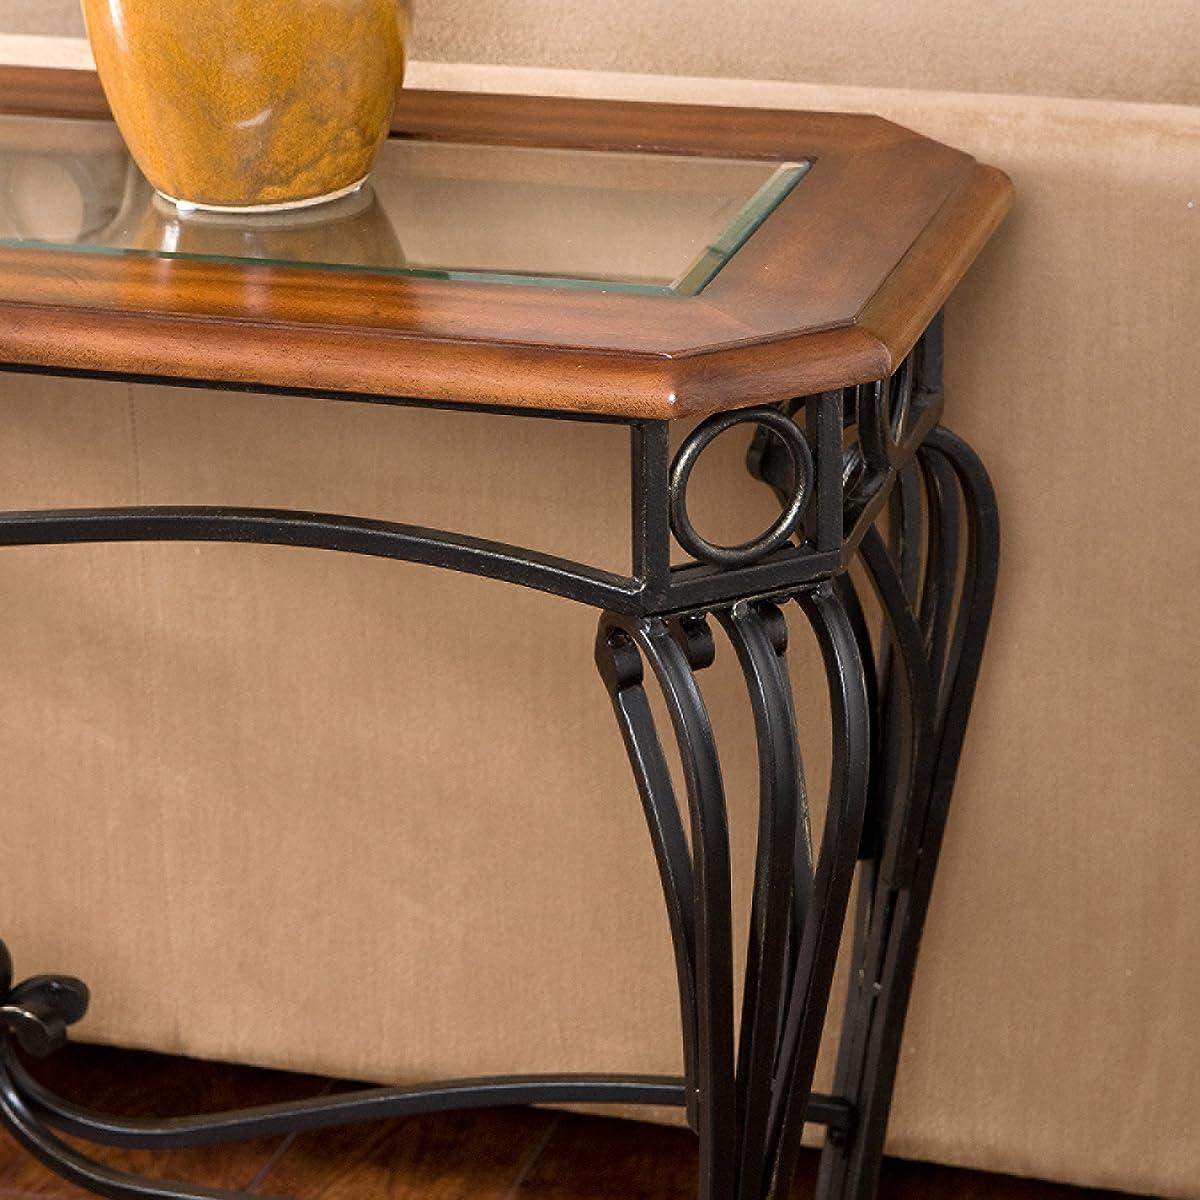 Southern Enterprises Prentice Sofa Console Table, Dark Cherry with Black Finish